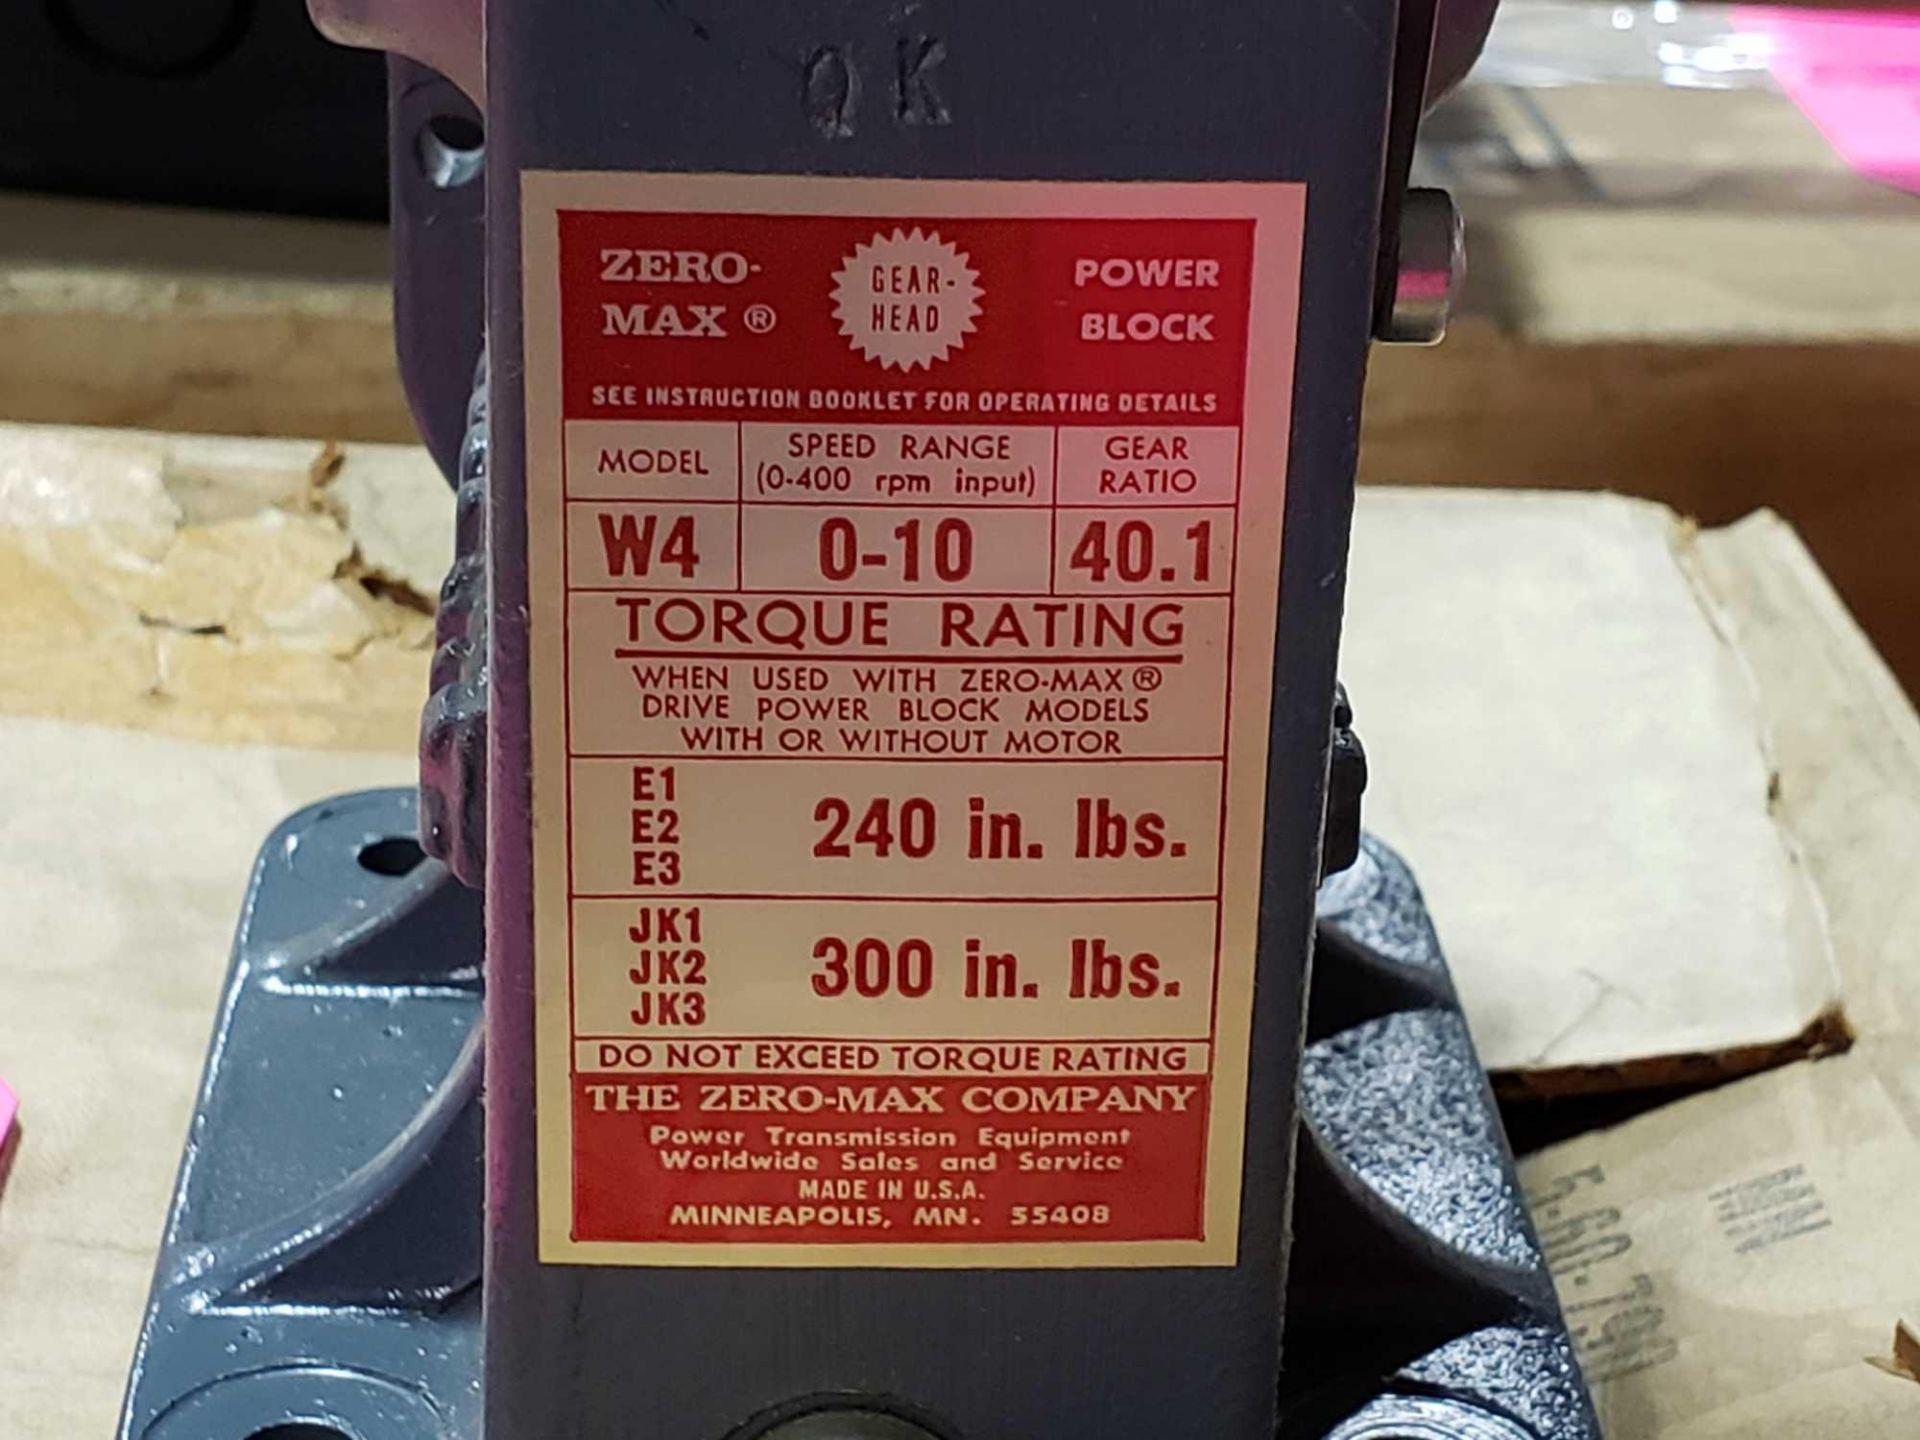 Lot 23 - Zero-max power block model W4, speed range 0-10, gear ratio 40.1. New in box.